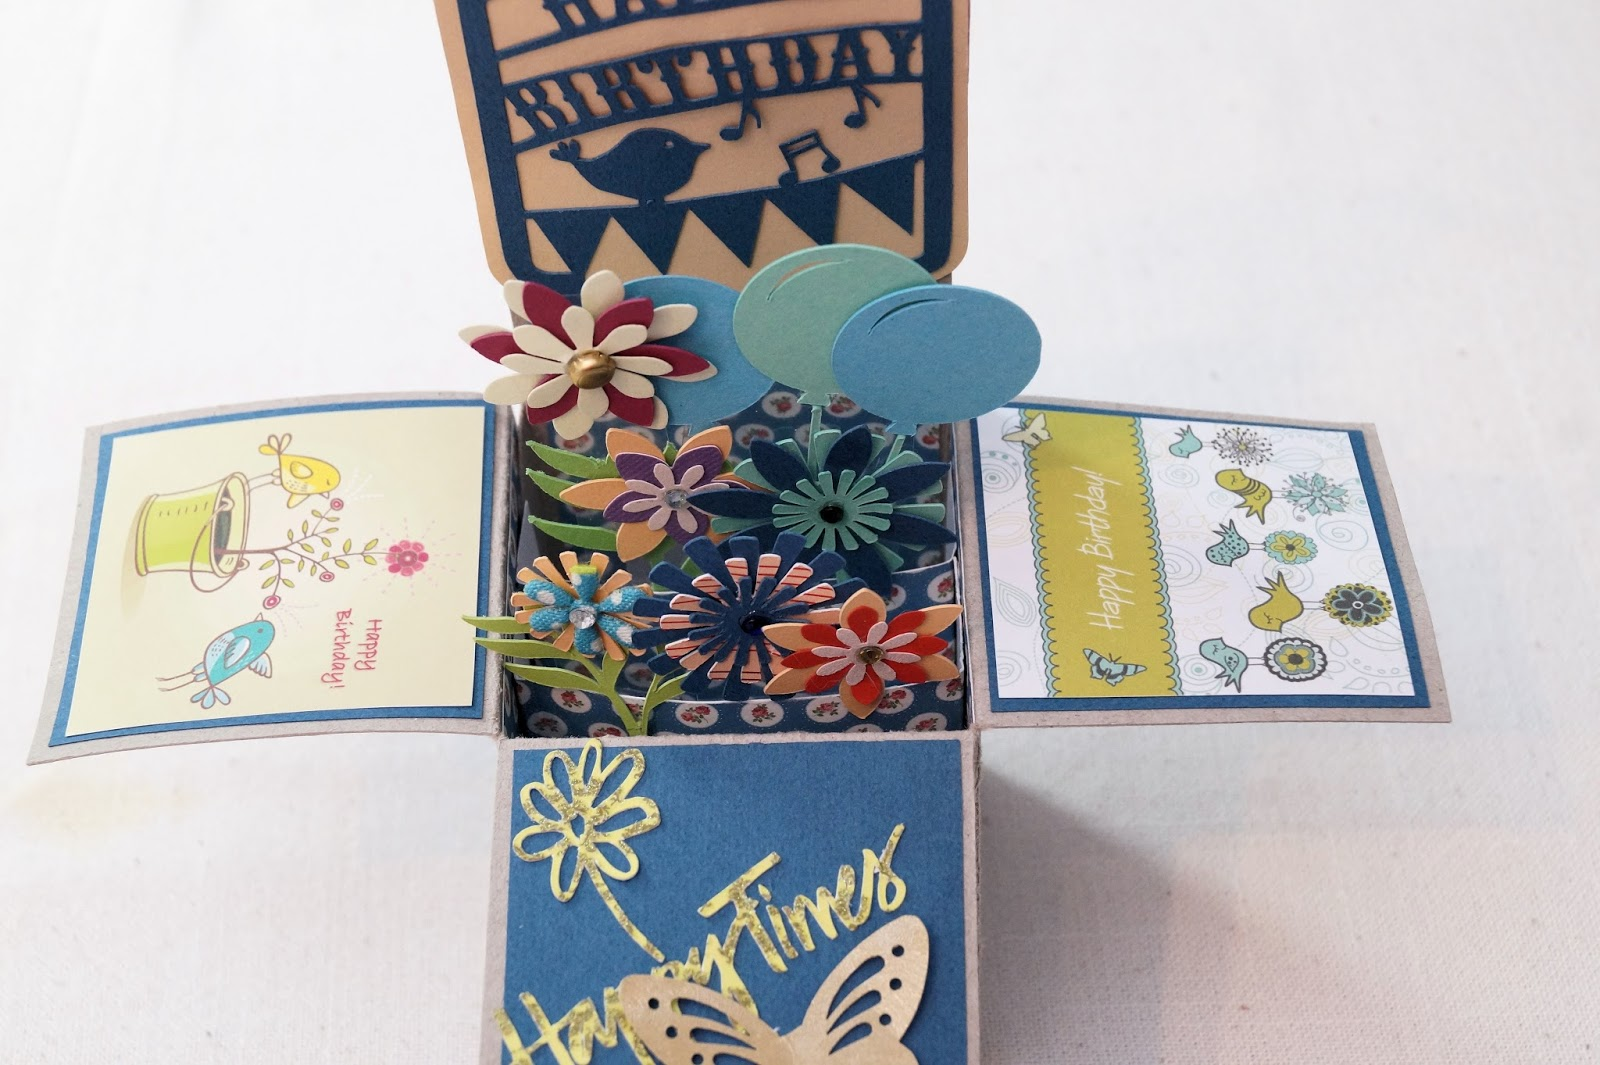 Pop up box geburtstagskarte - Geburtstagskarte pop up ...